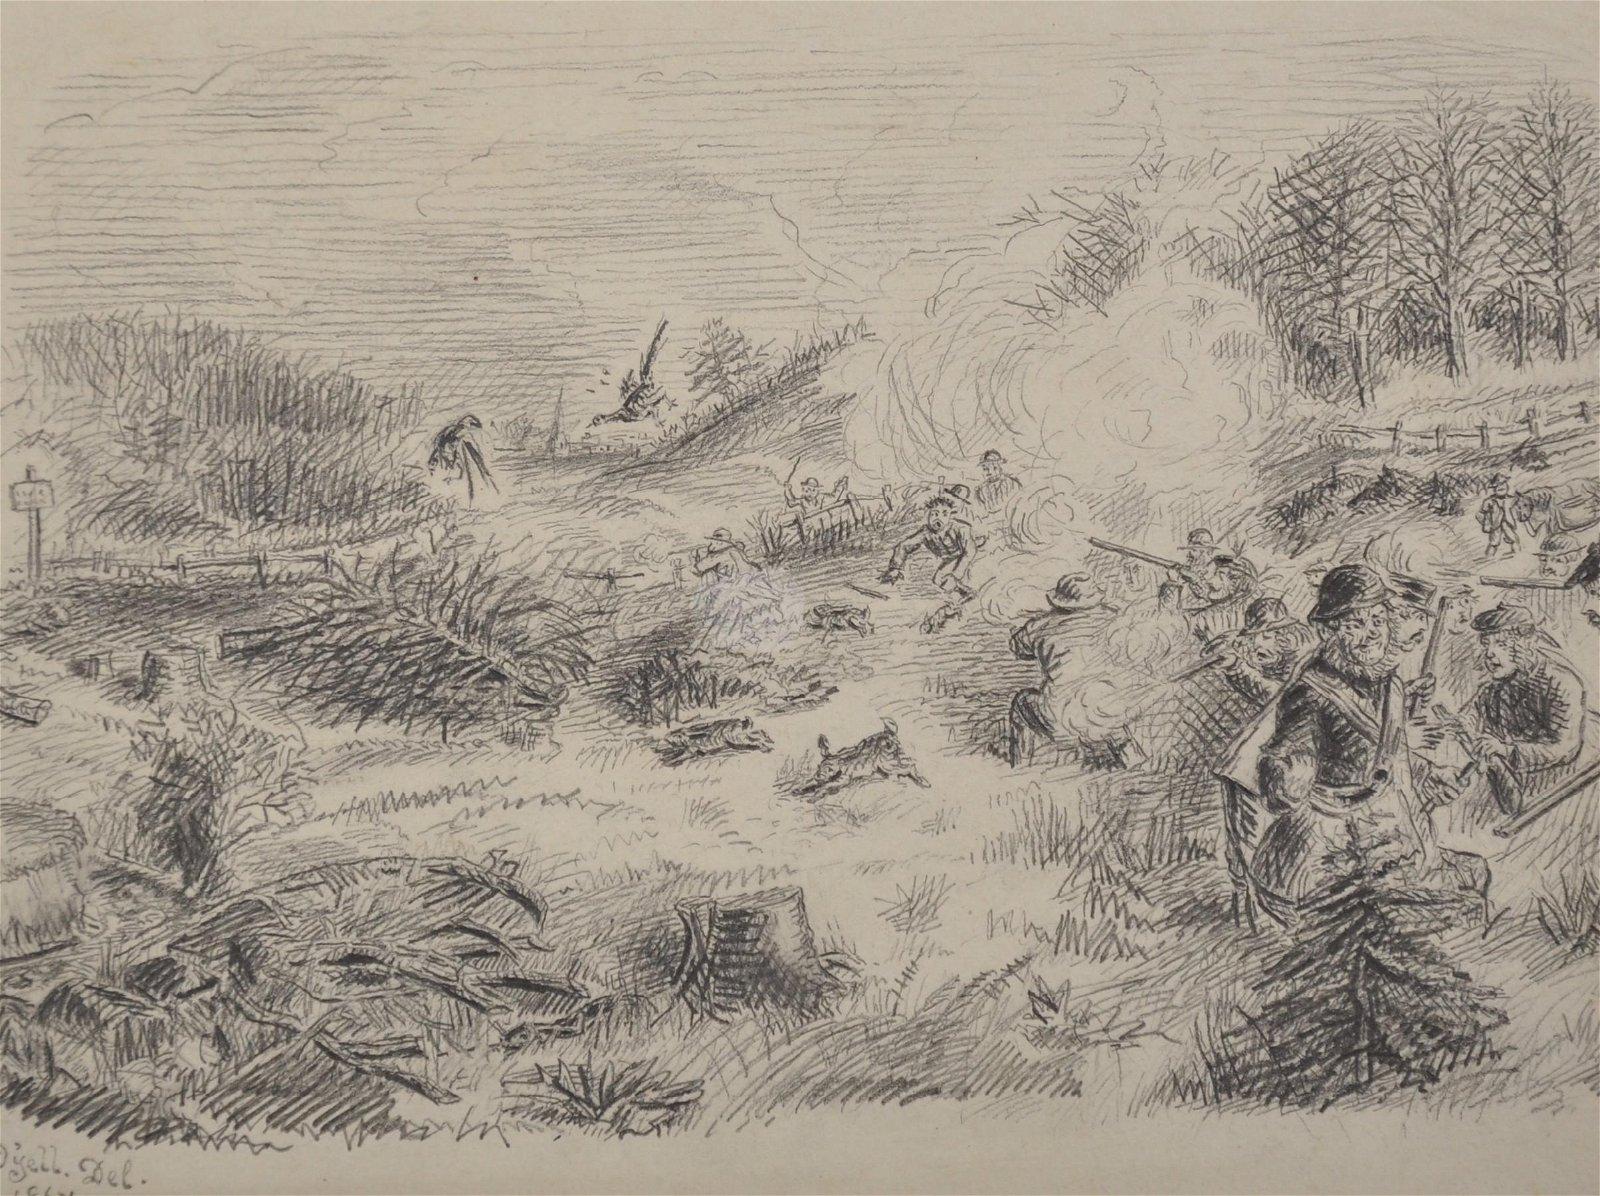 John James Dalyell (19th Century) British. A Shooting